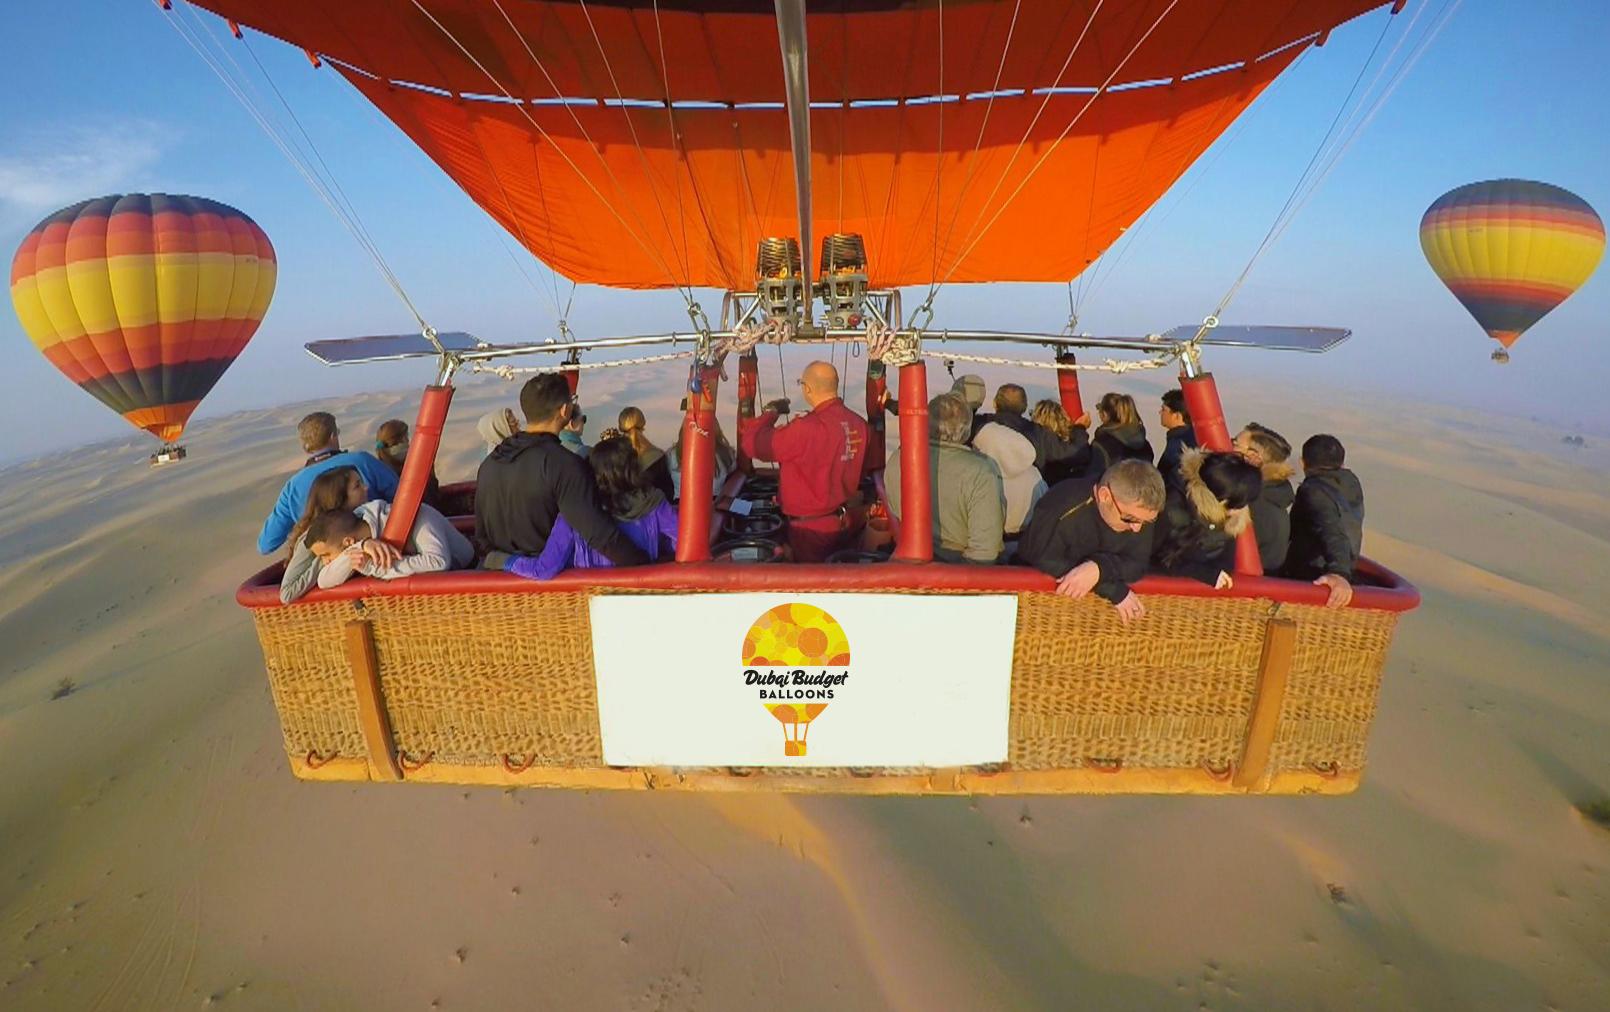 Balloon Rides In Dubai